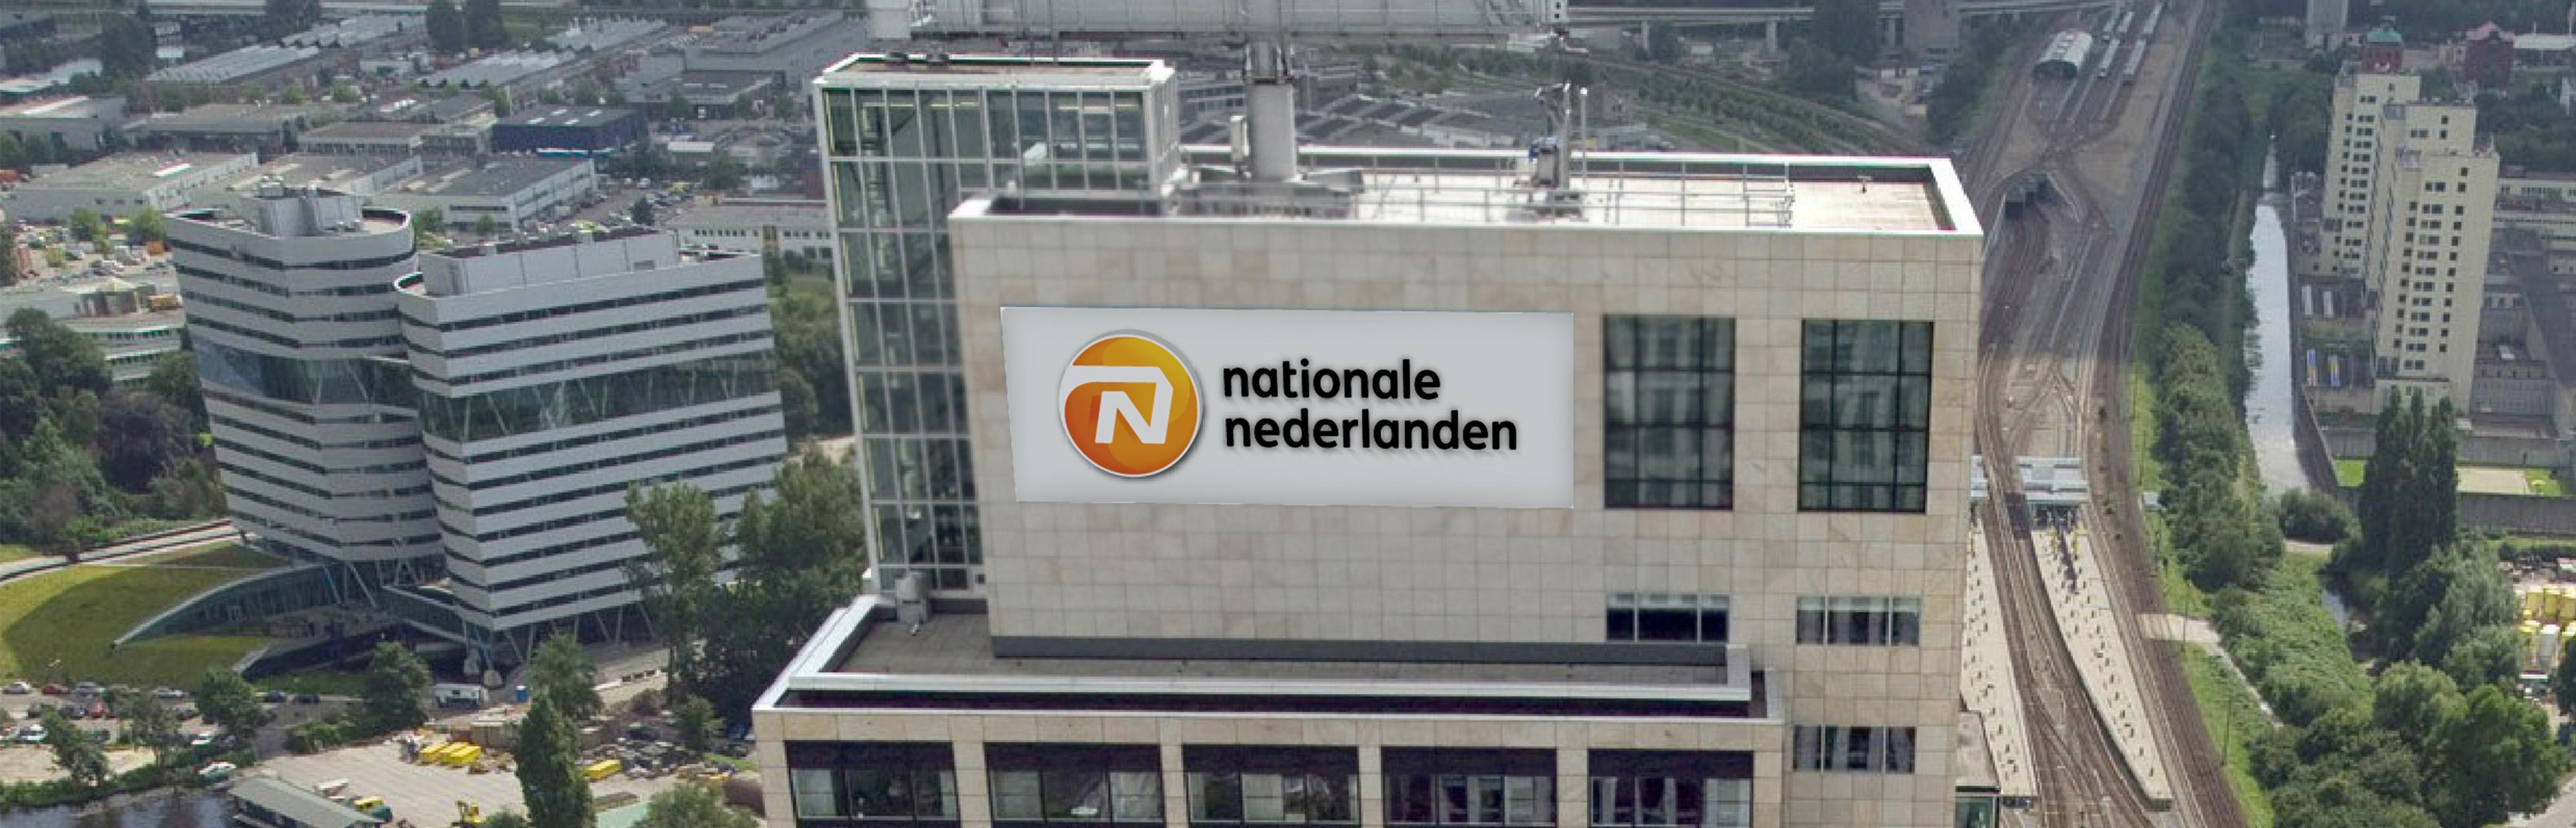 Nationale Nederlanden Amsterdam